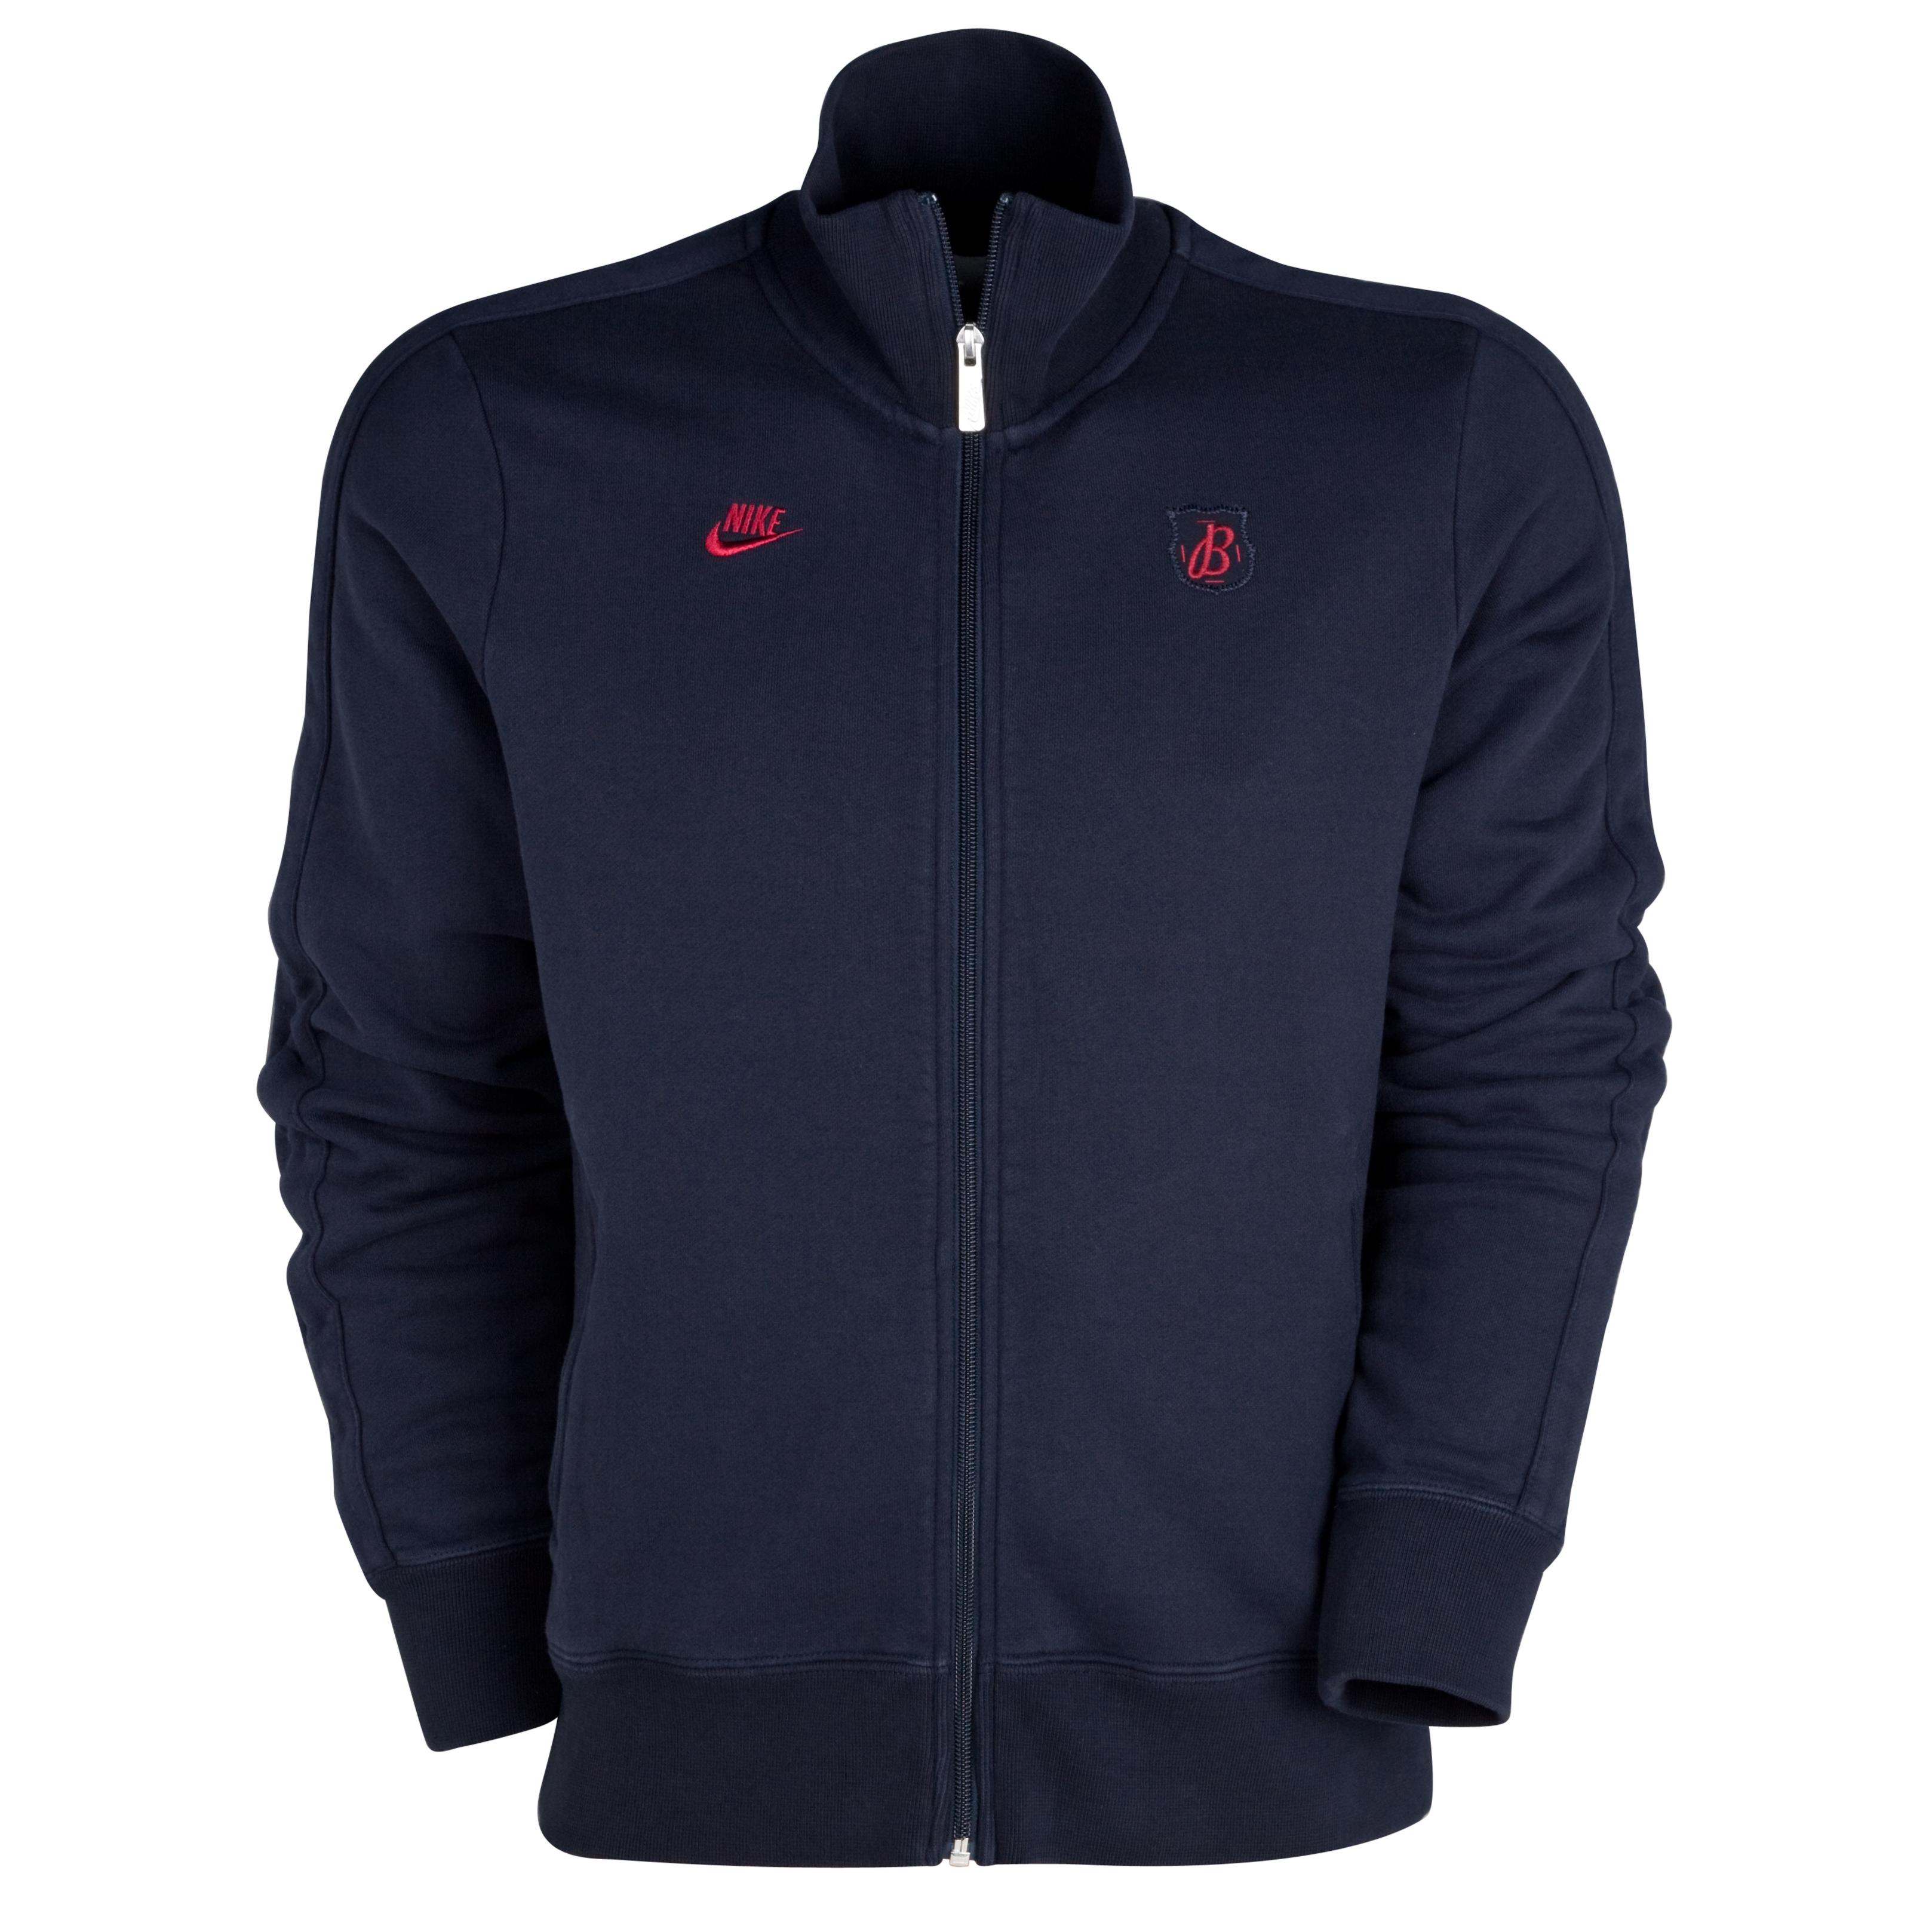 Barcelona GF N98 Sweat Jacket - Dark Obsidian/ Team Red. for 60€